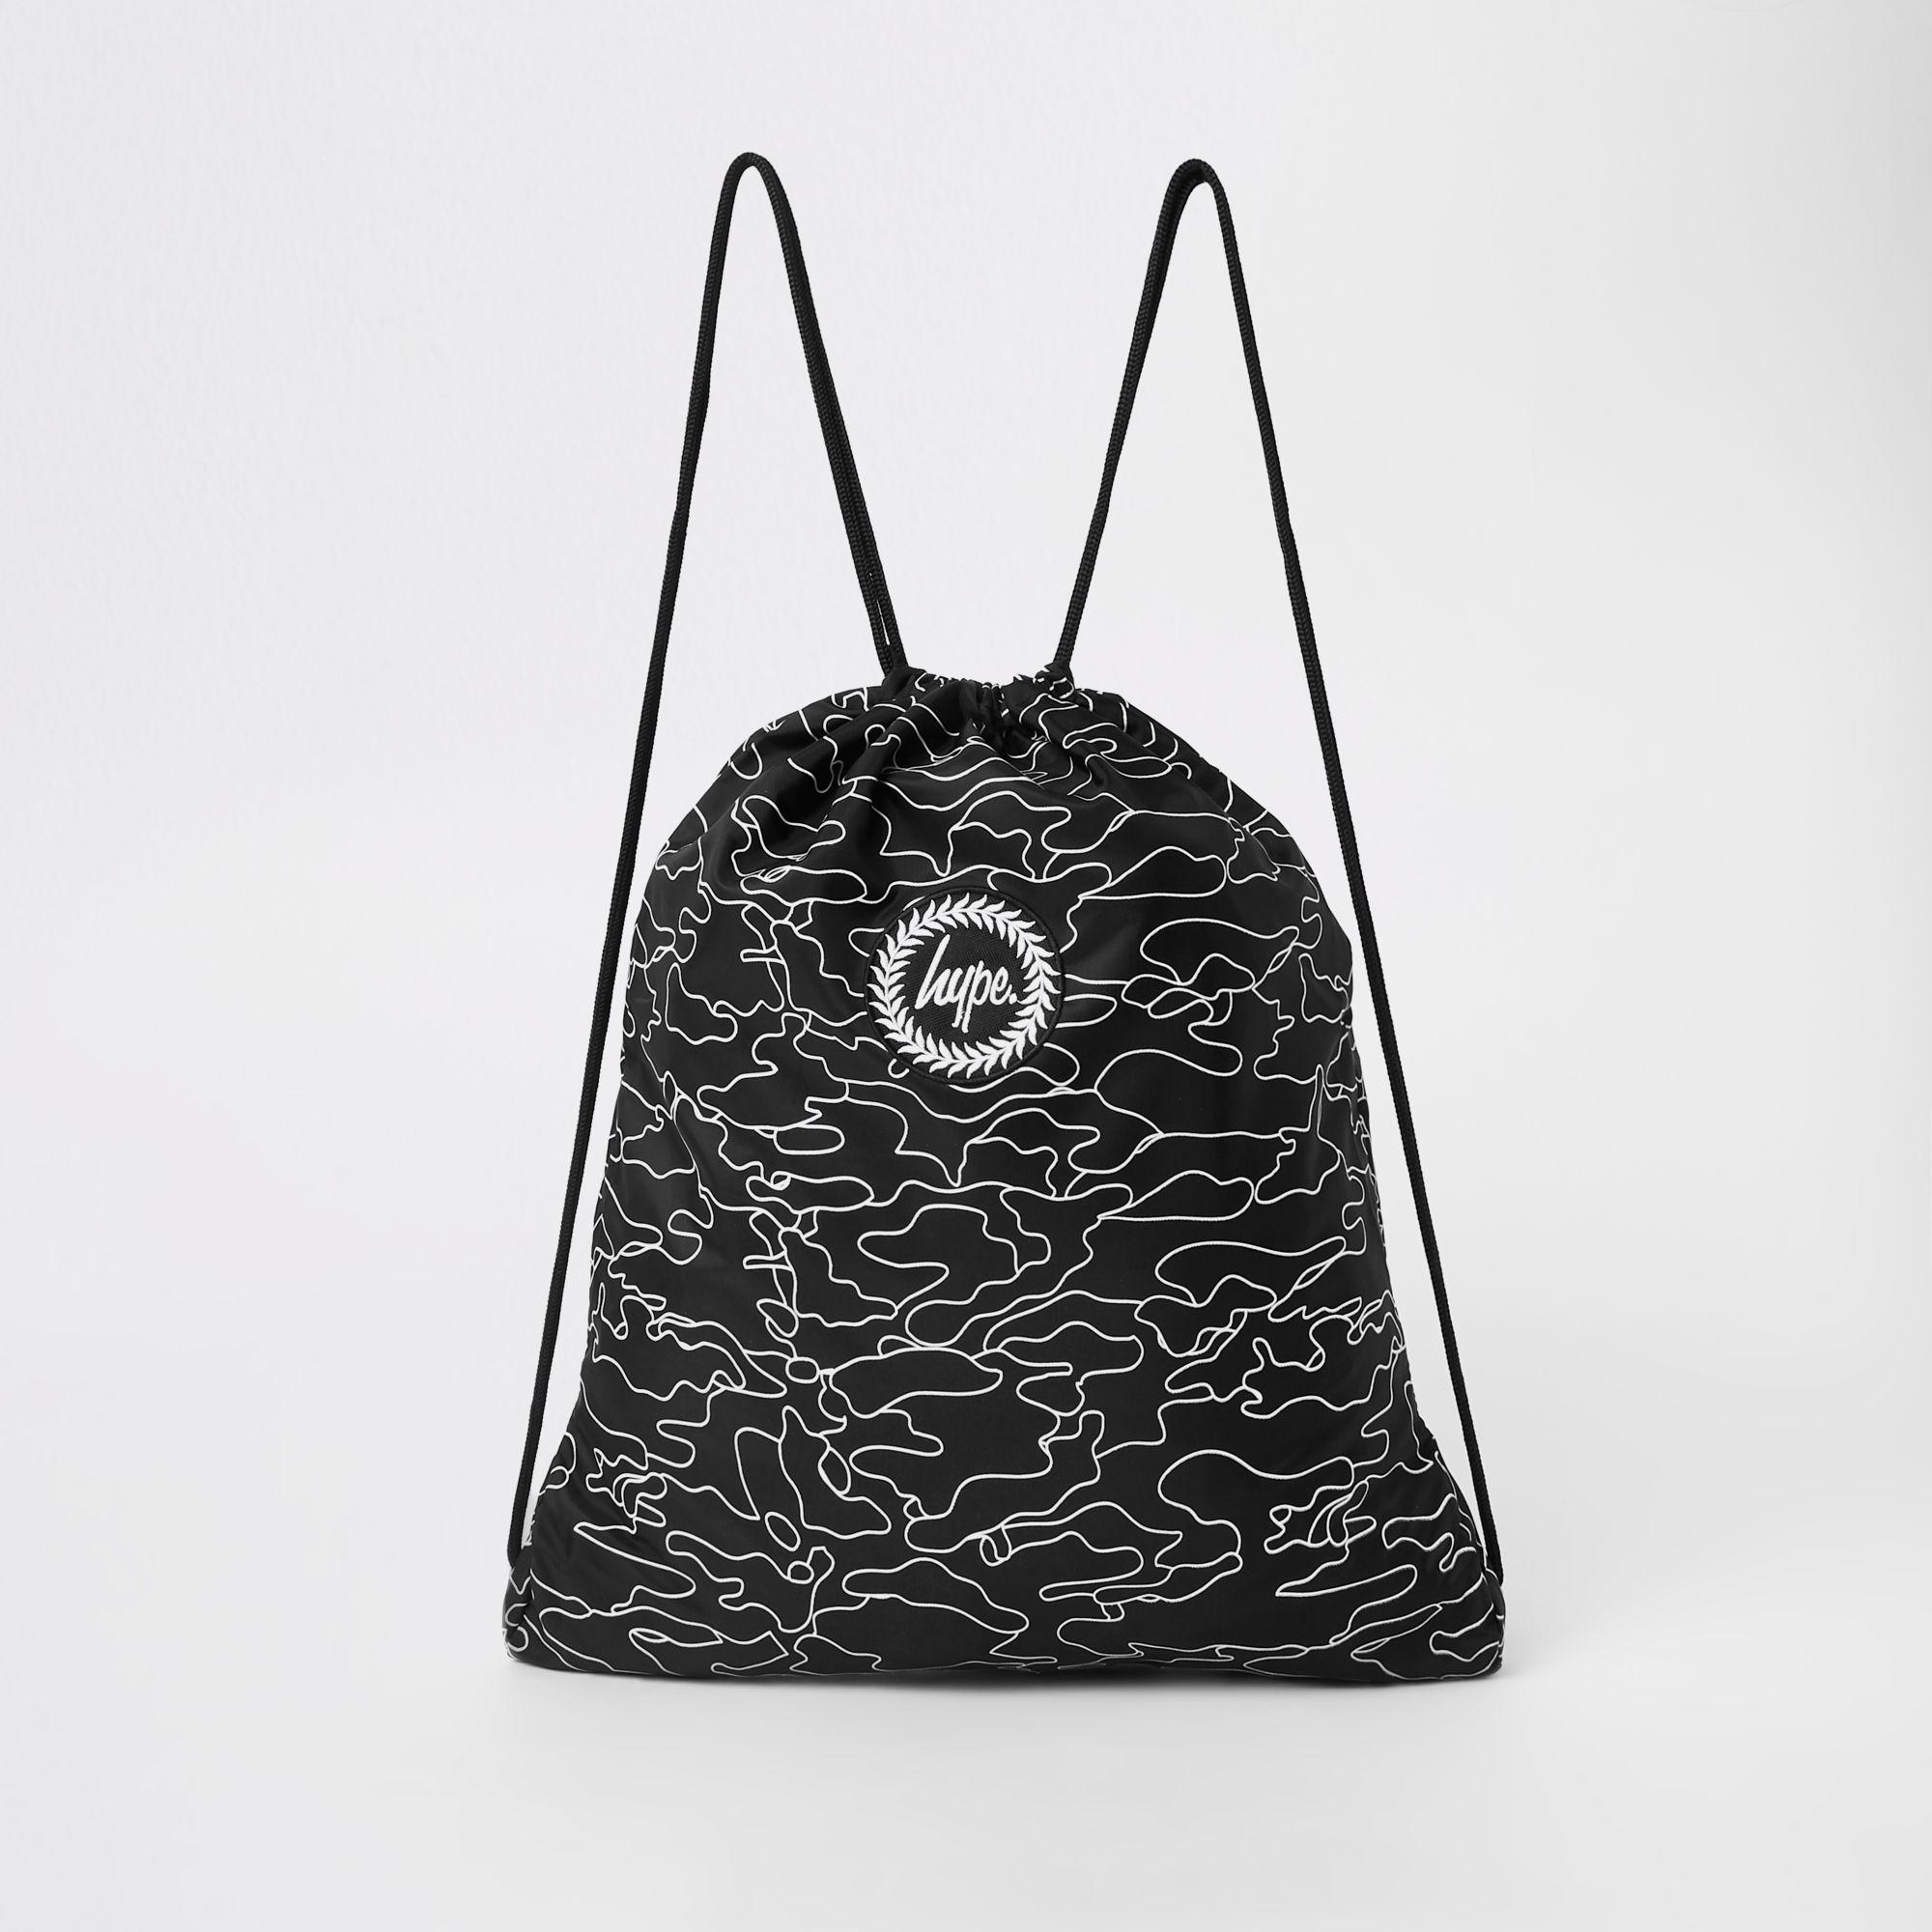 Lyst - River Island Hype Black Logo Print Drawstring Bag in Black ... c3441beb37cf3